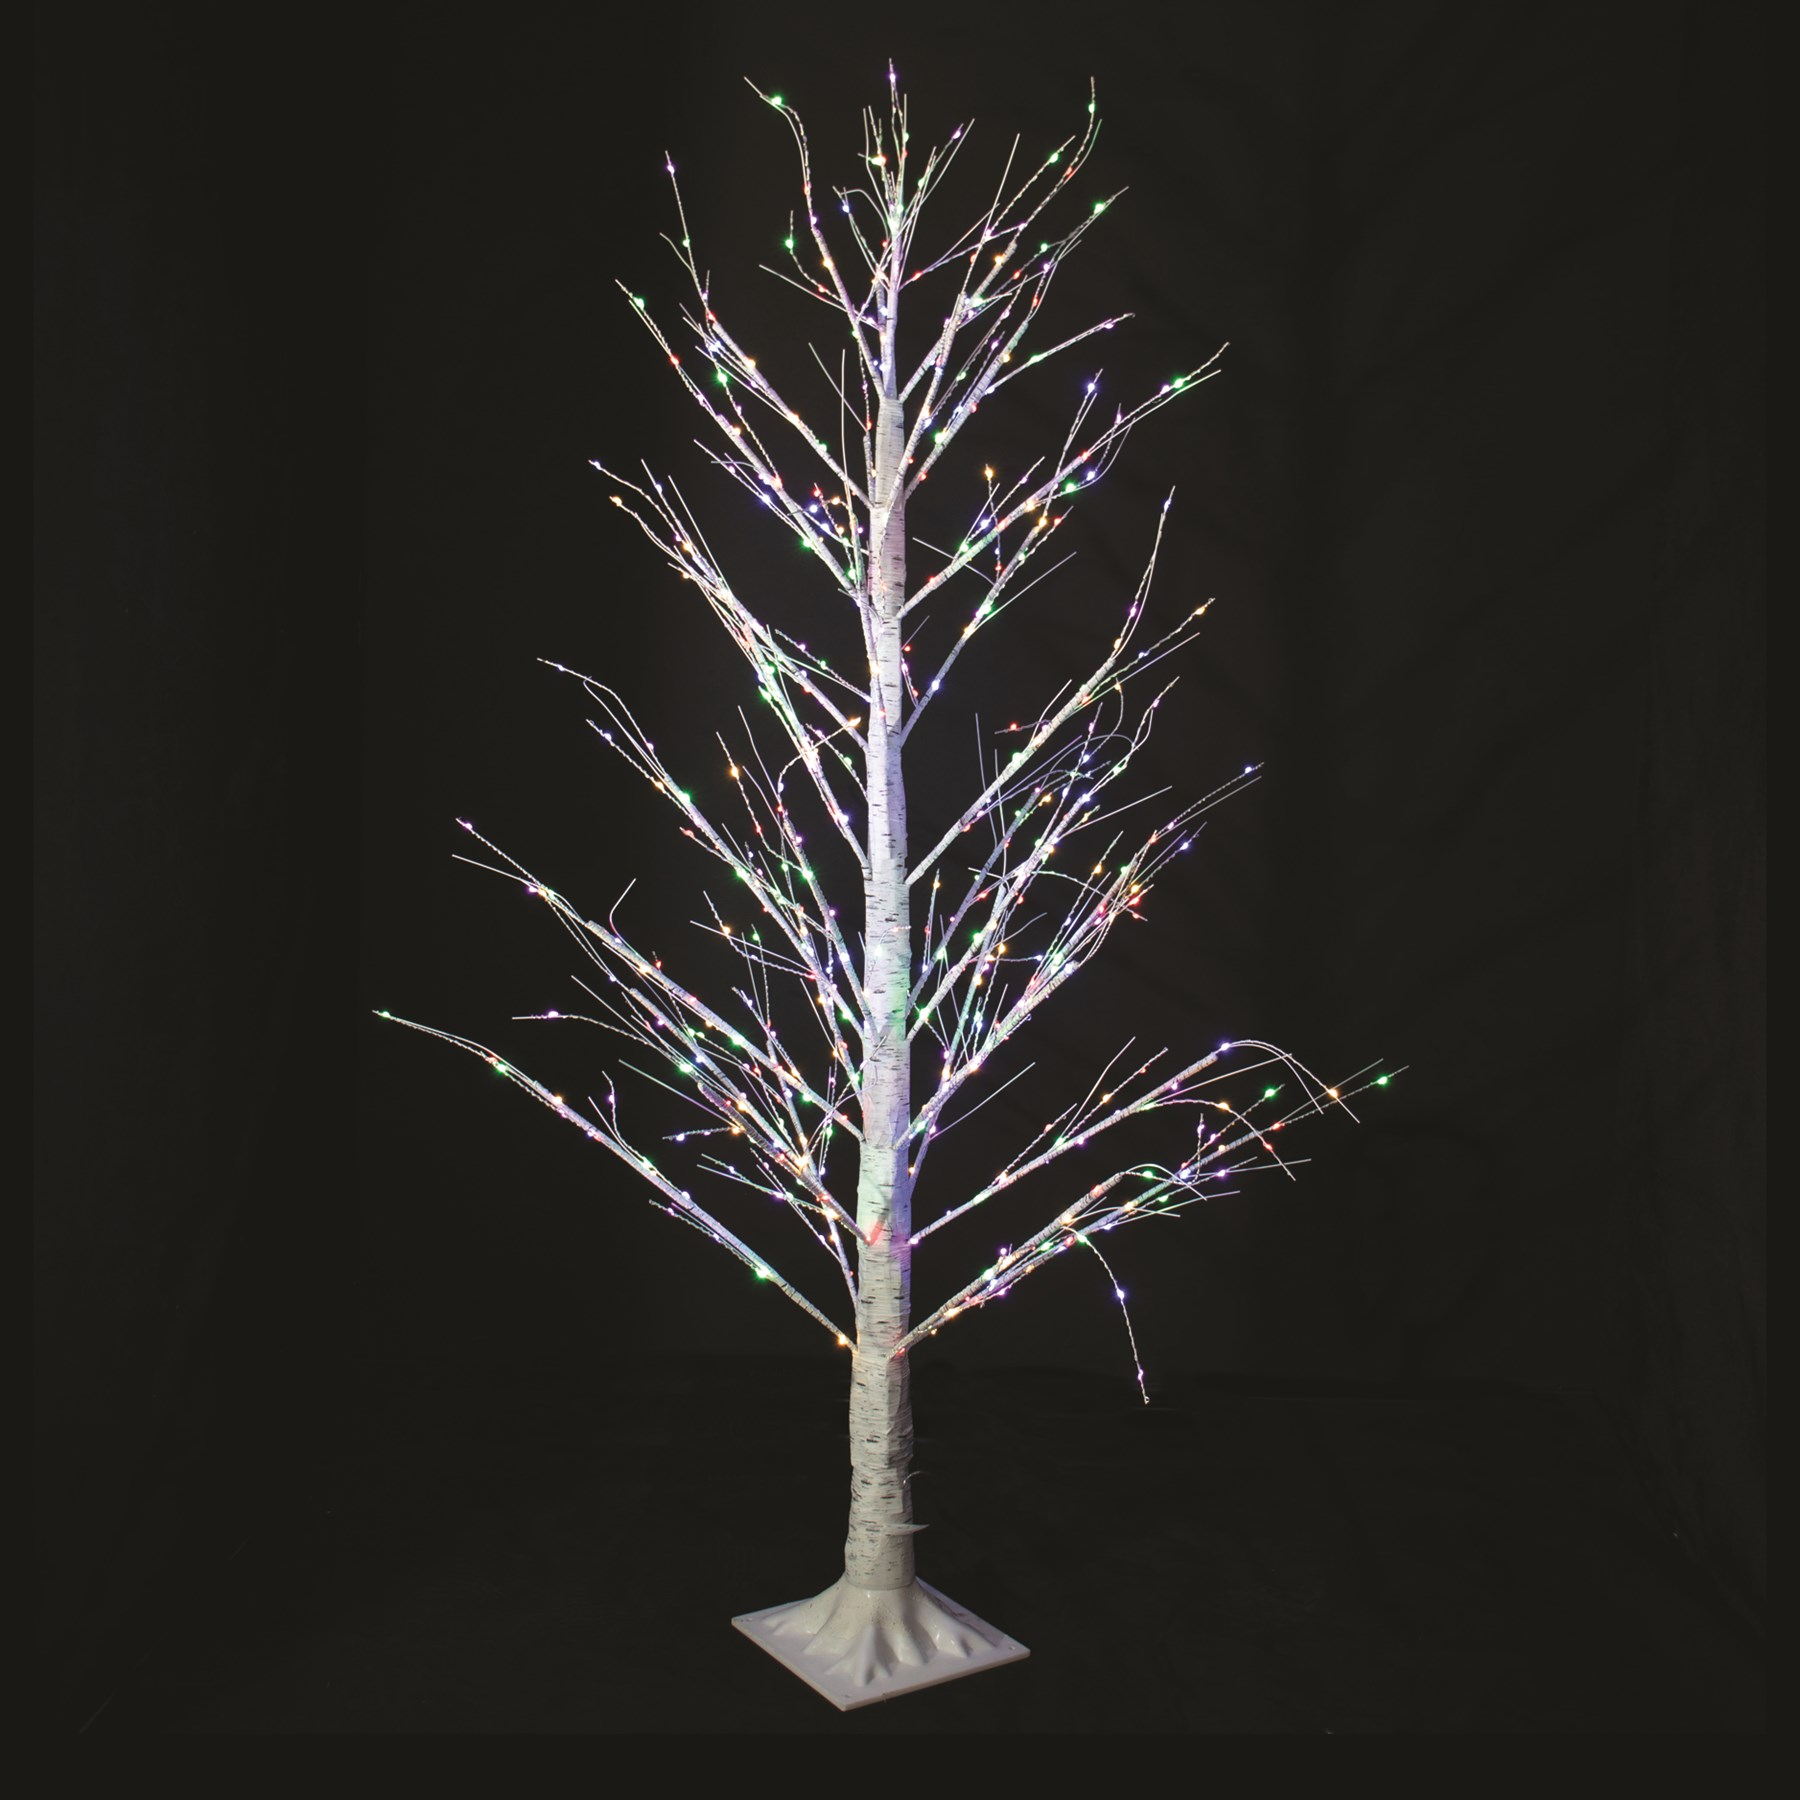 LED Twinkling Tree large